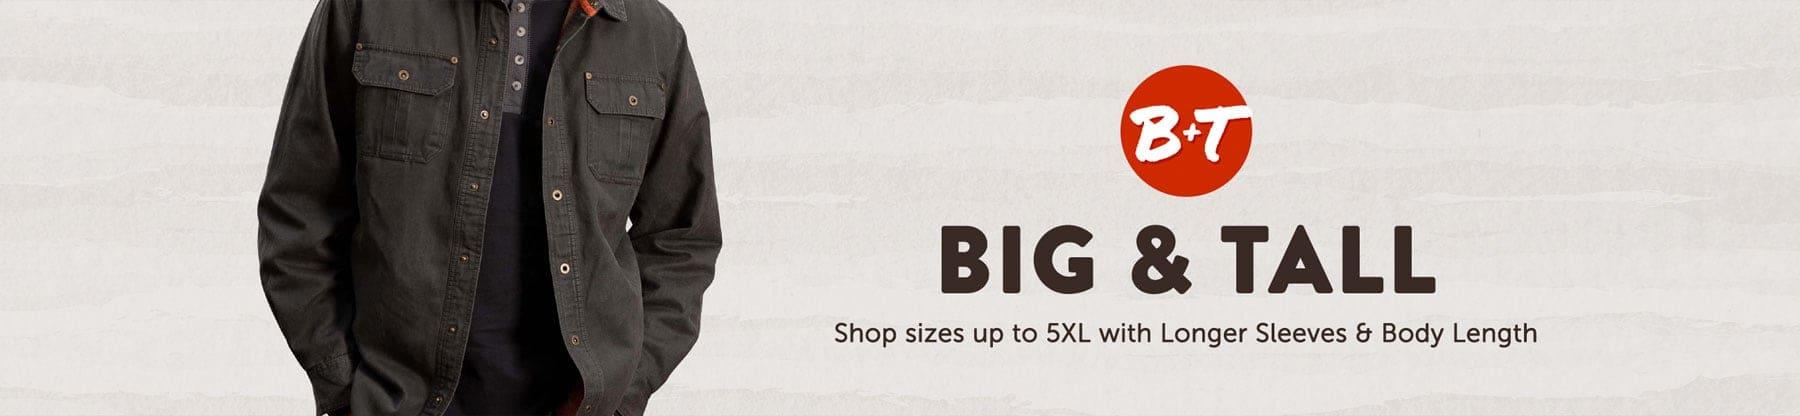 Men's Big and Tall Journeyman Shirt Jacket